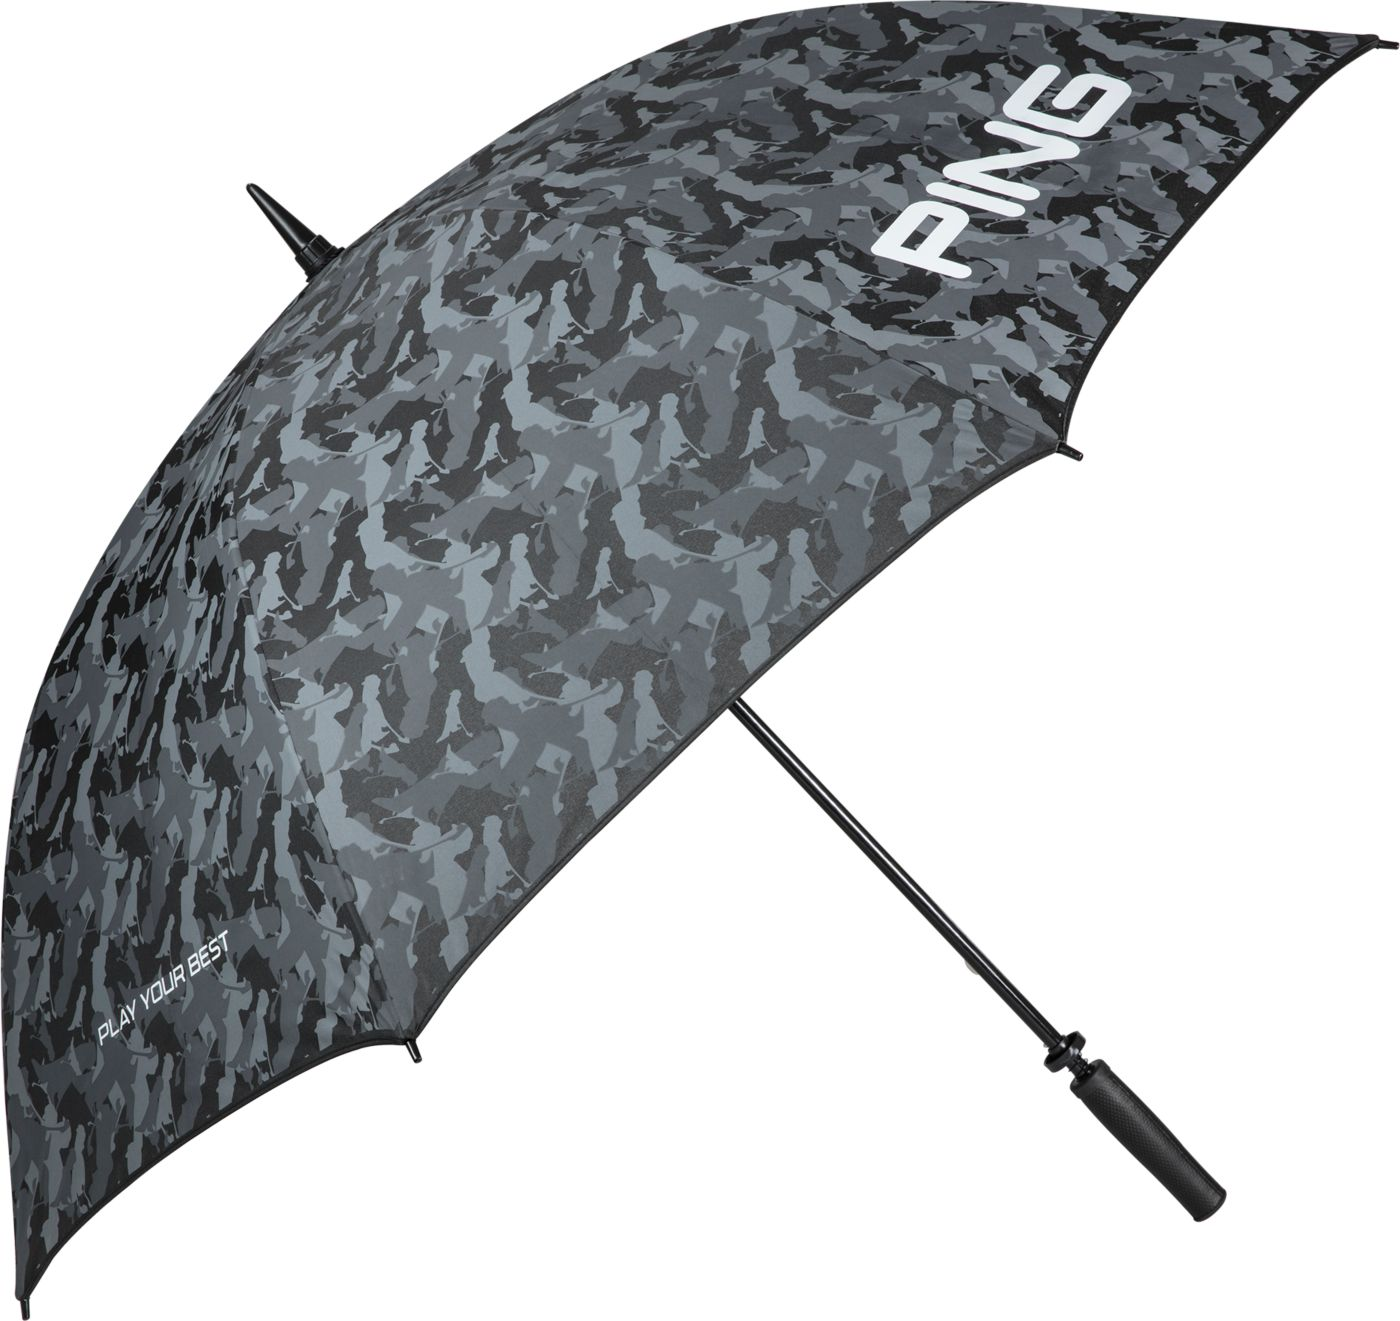 PING Camo Single Canopy Golf Umbrella